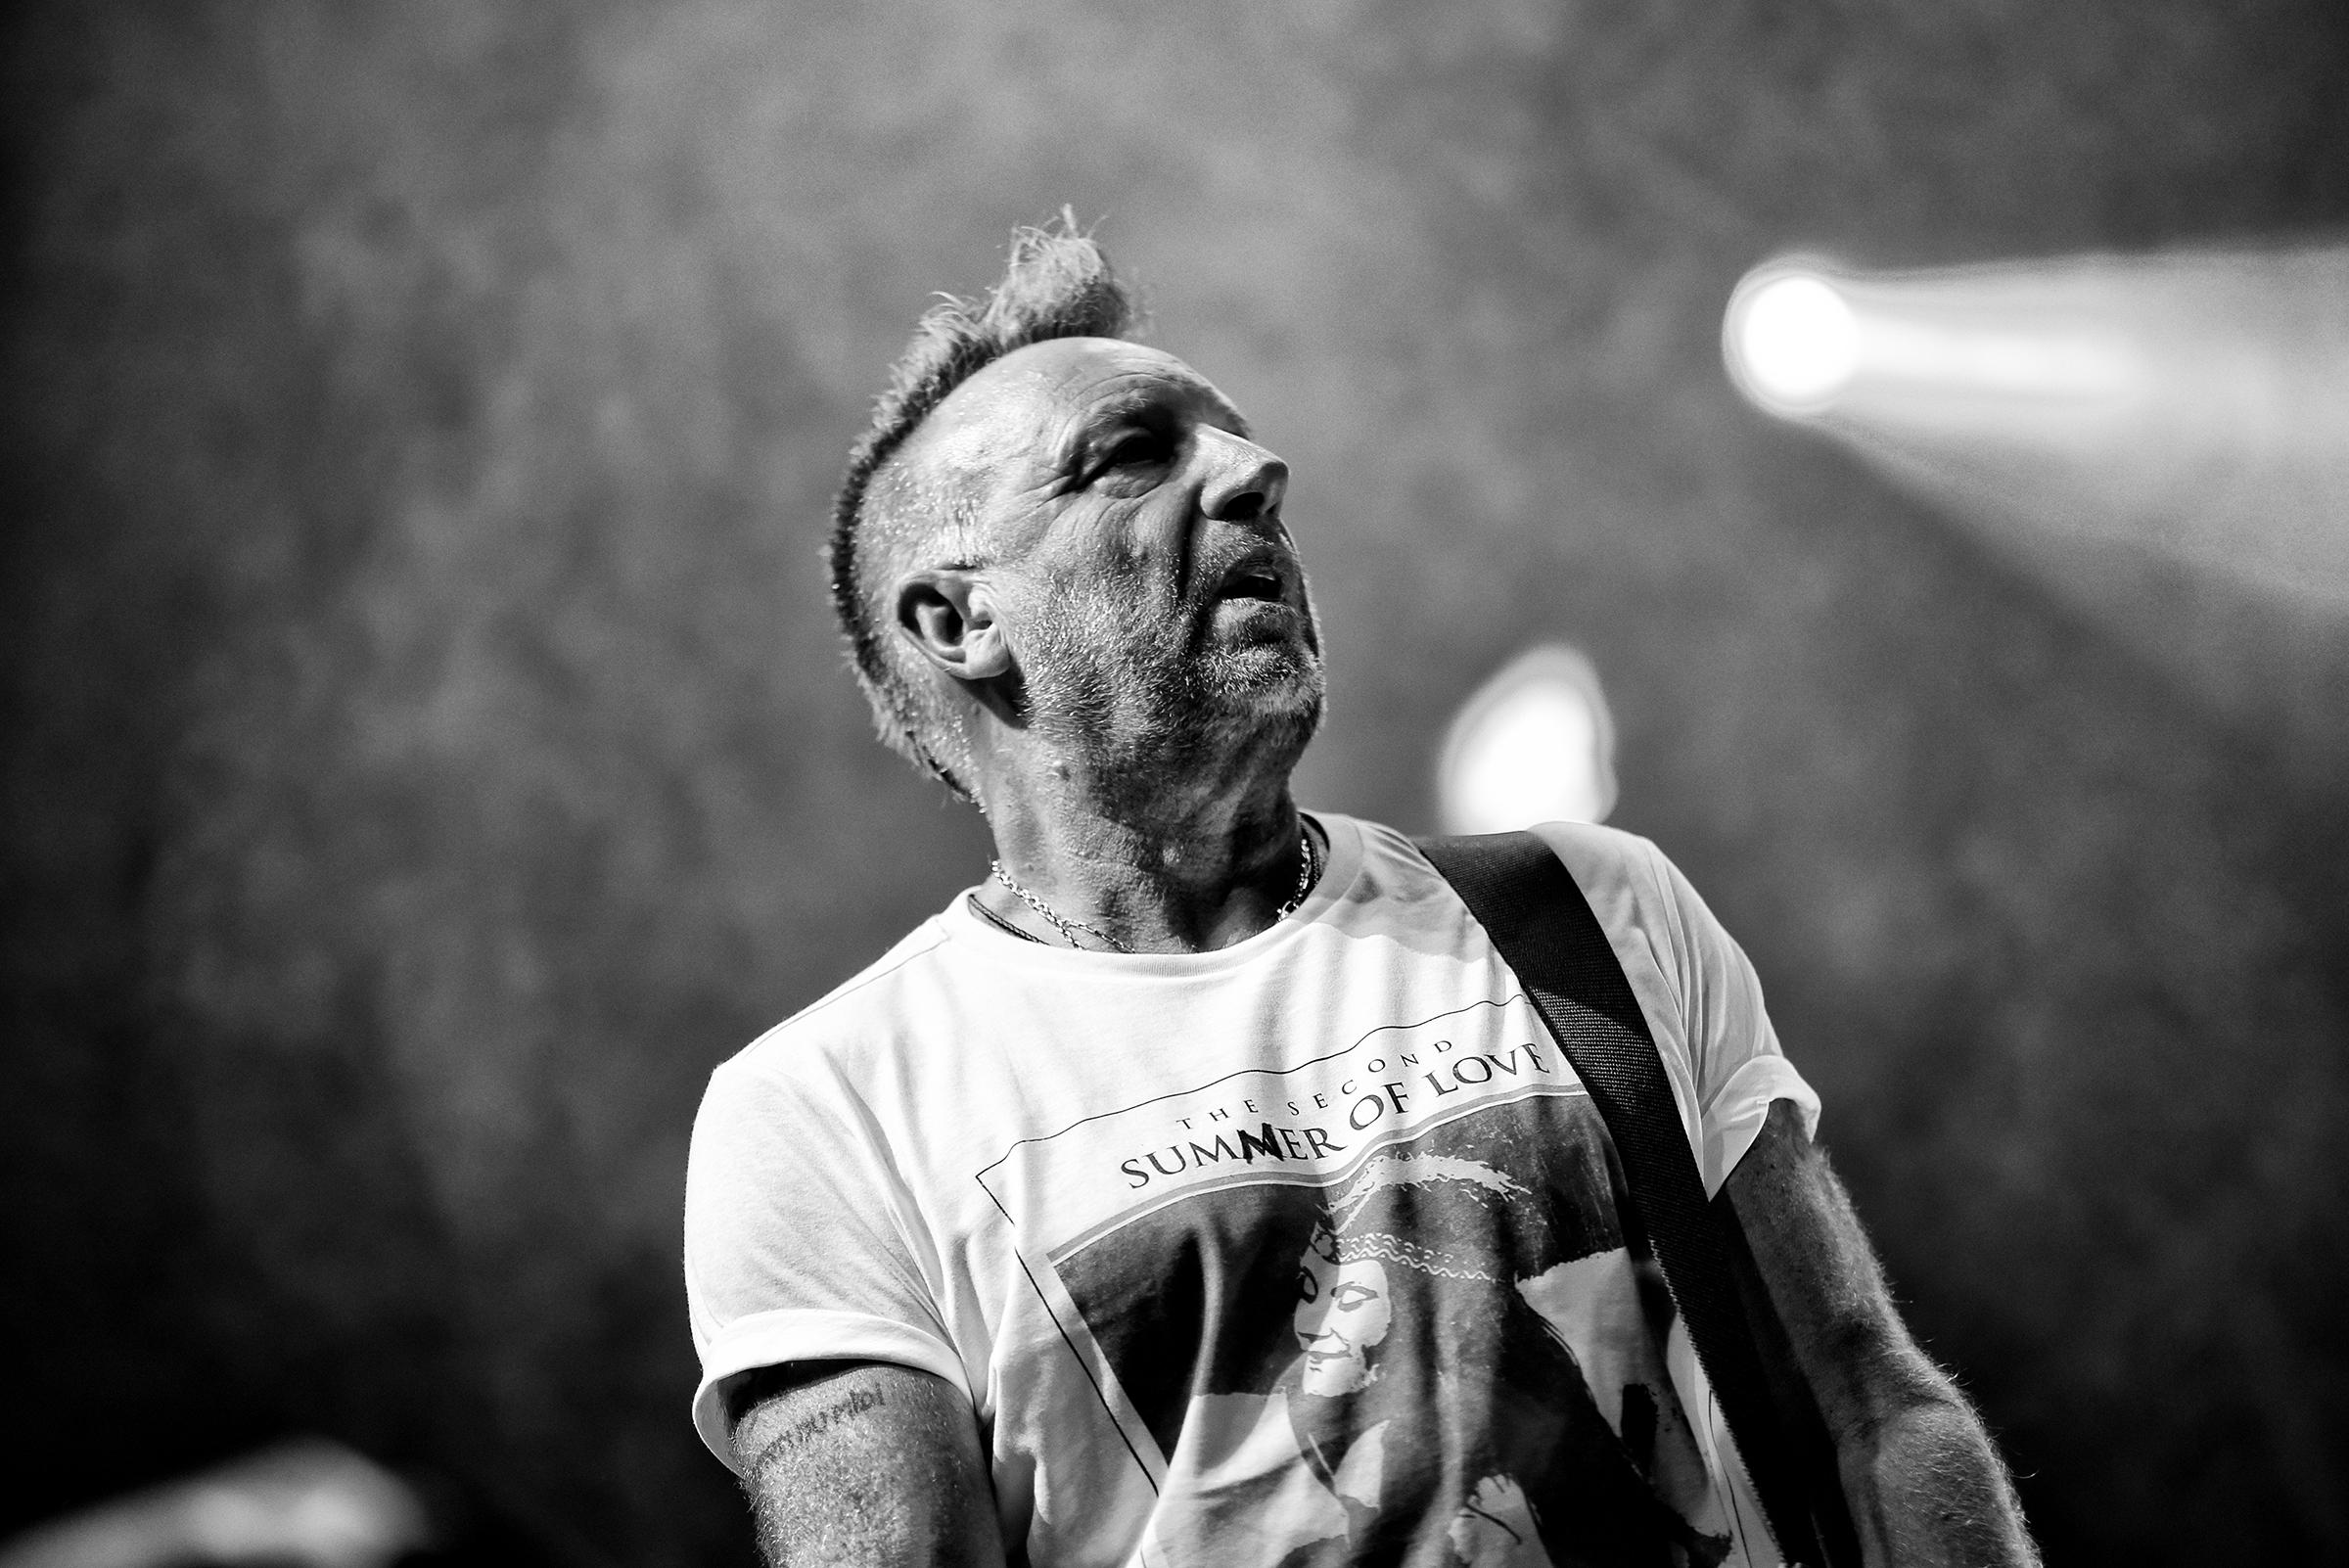 INTERVIEW: Peter Hook on K÷93 EP collaboration with Jaz Coleman & Geordie Walker 1